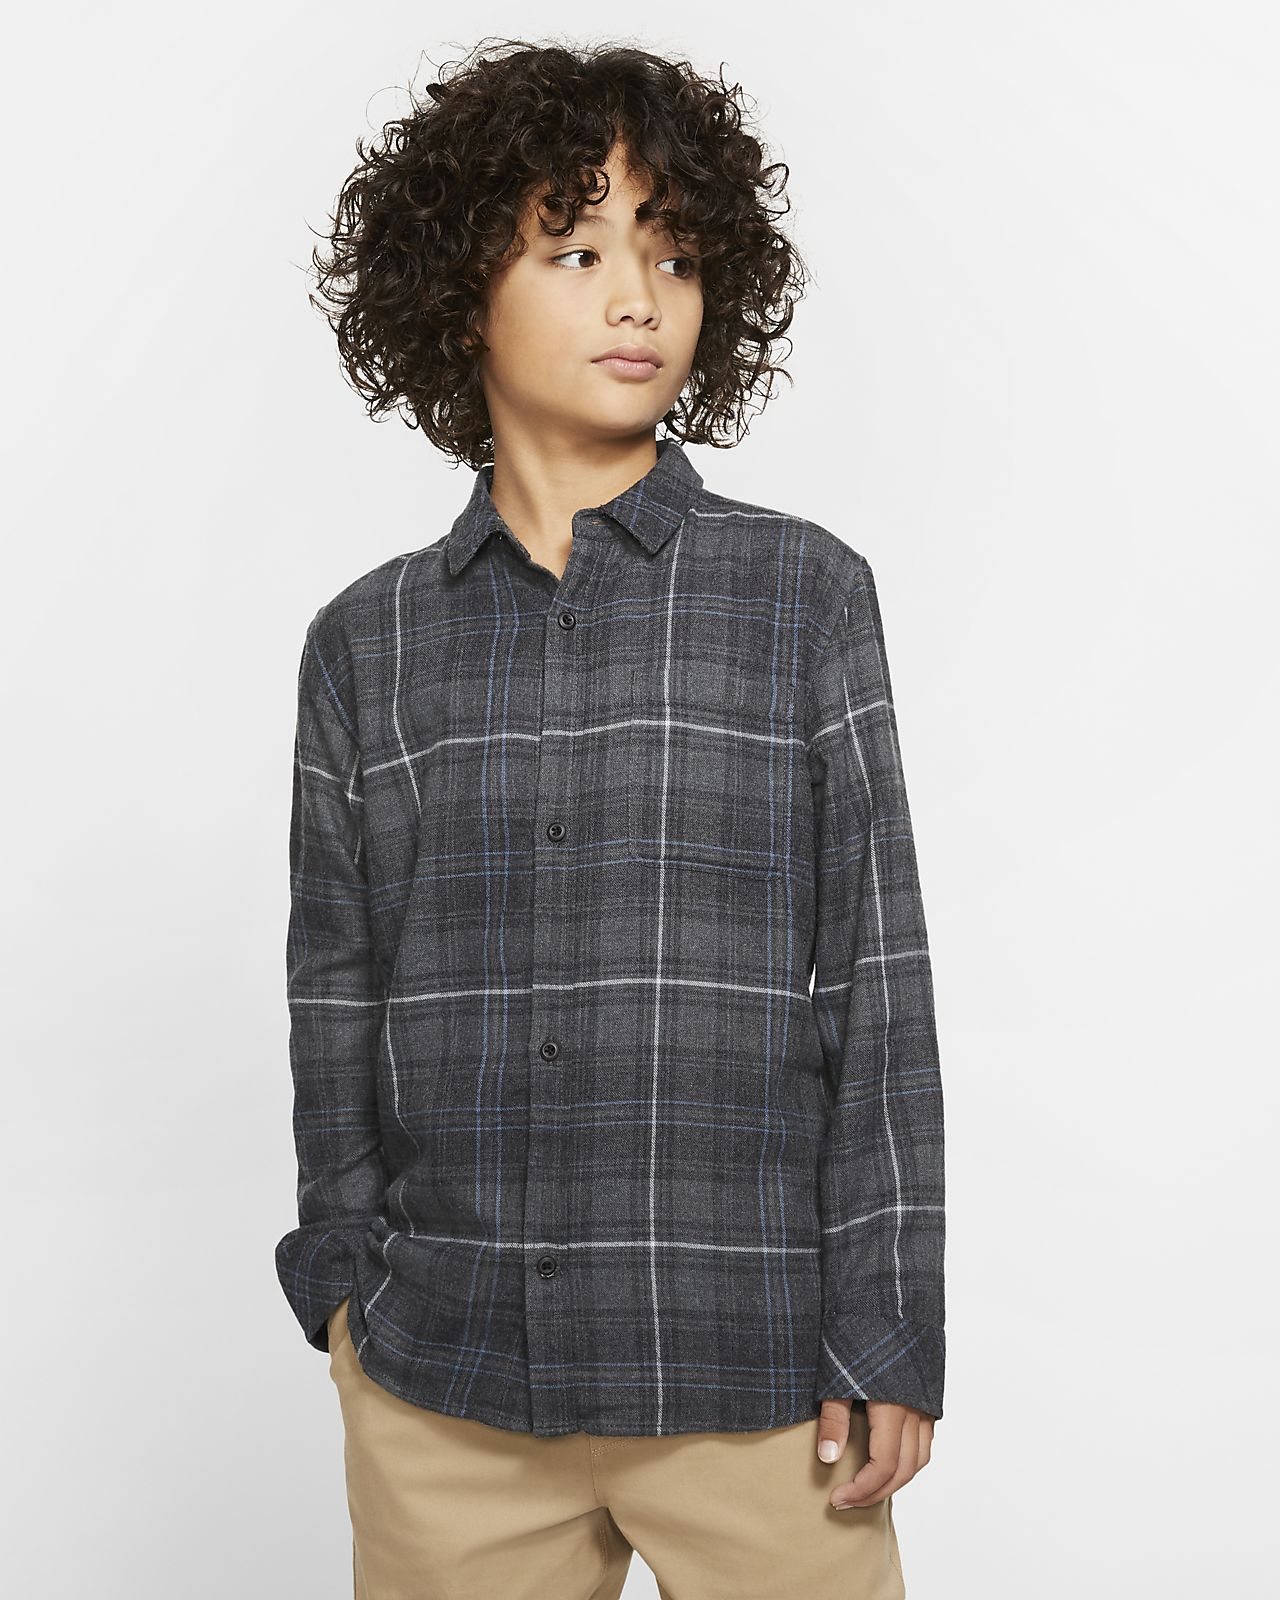 Hurley Vedder Washed Boys' Long-Sleeve Shirt